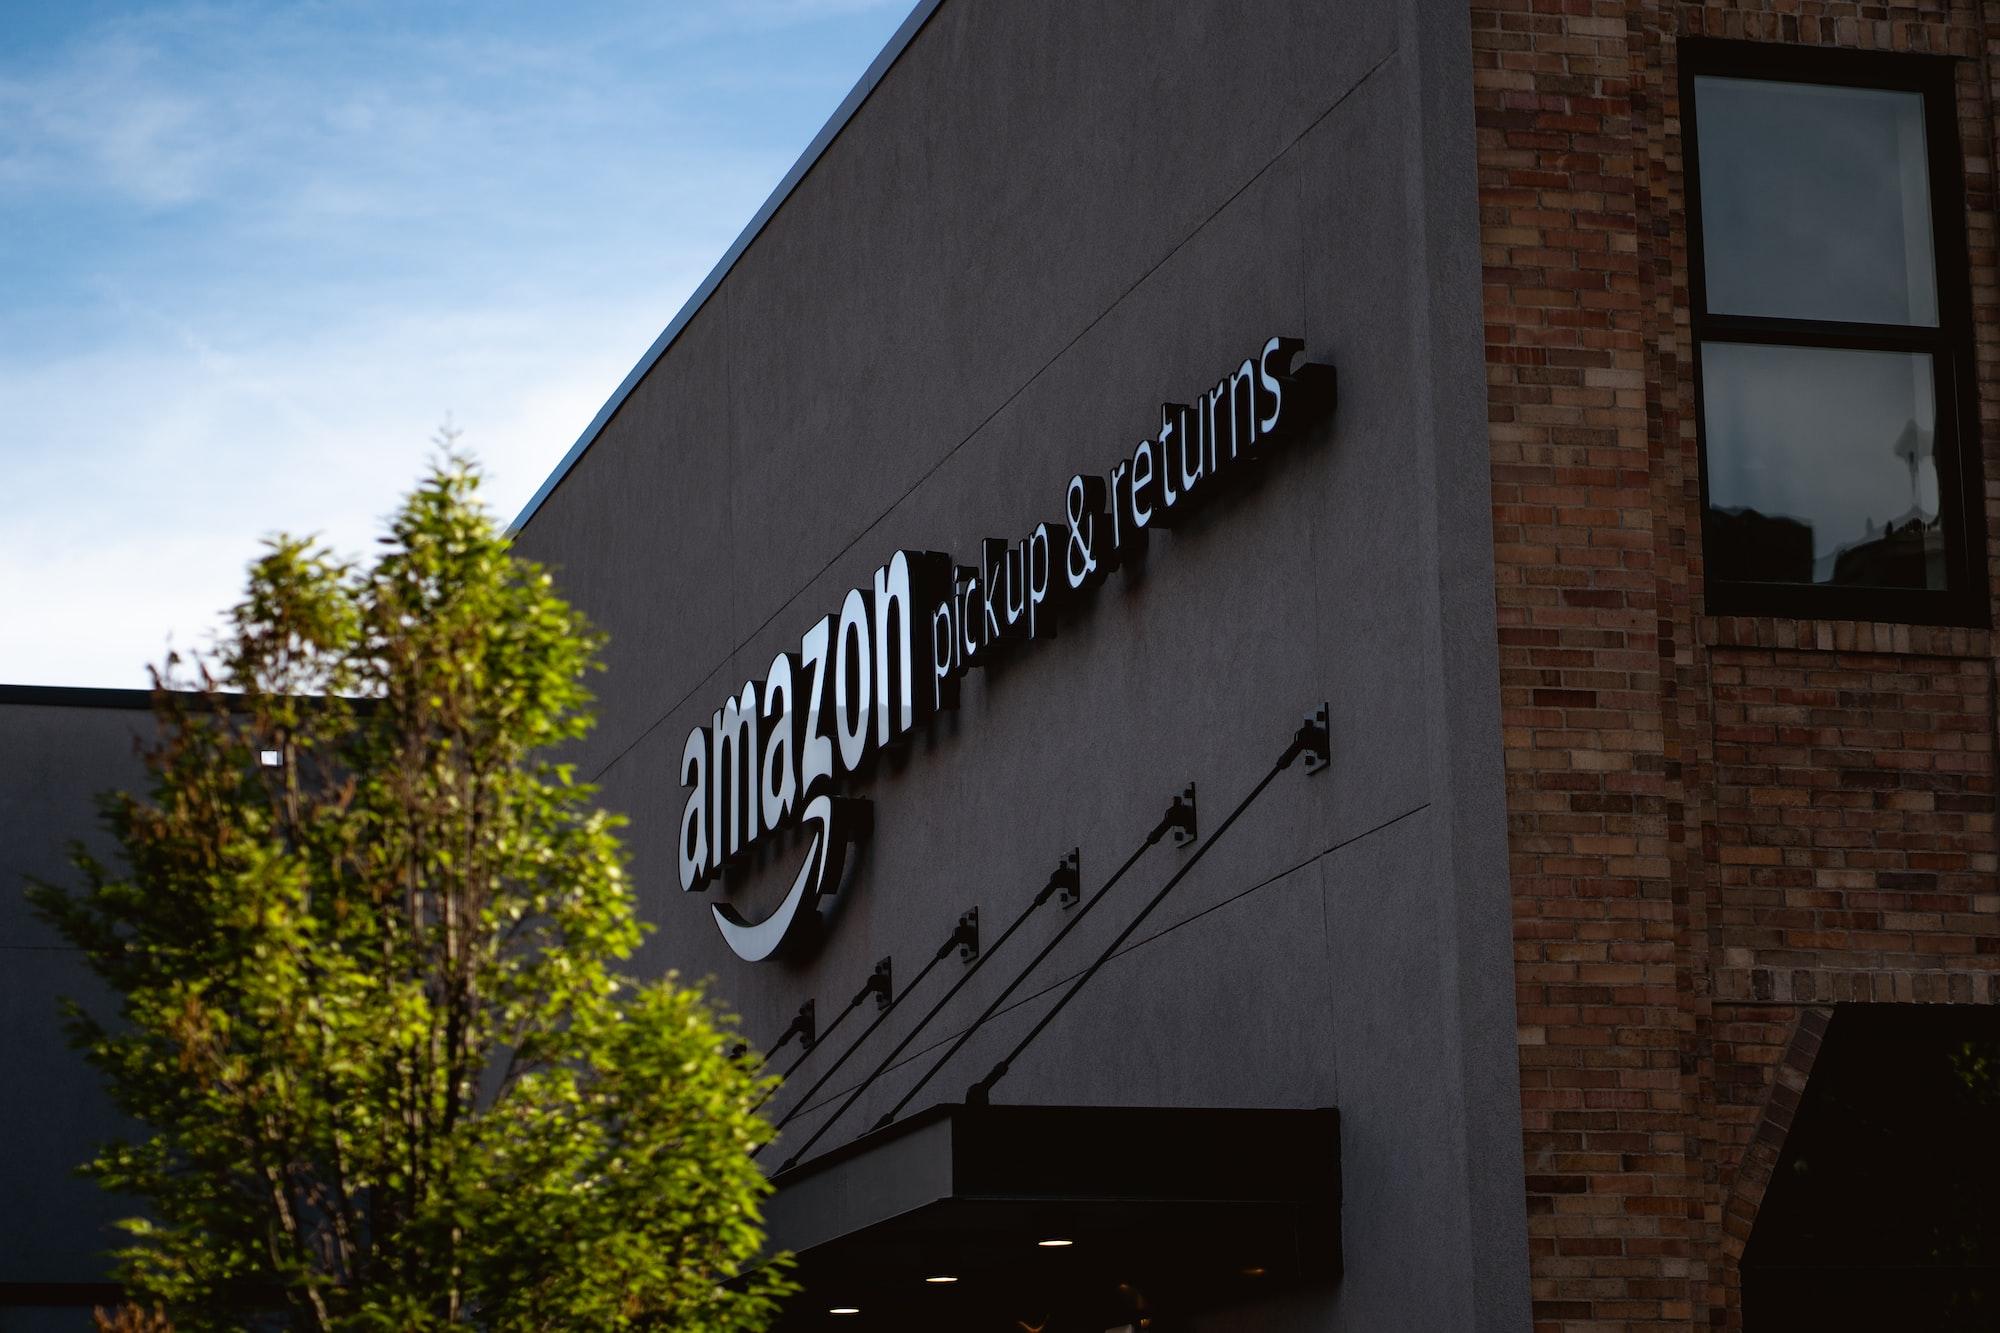 Amazon Pickup & Returns on South St. in Philadelphia